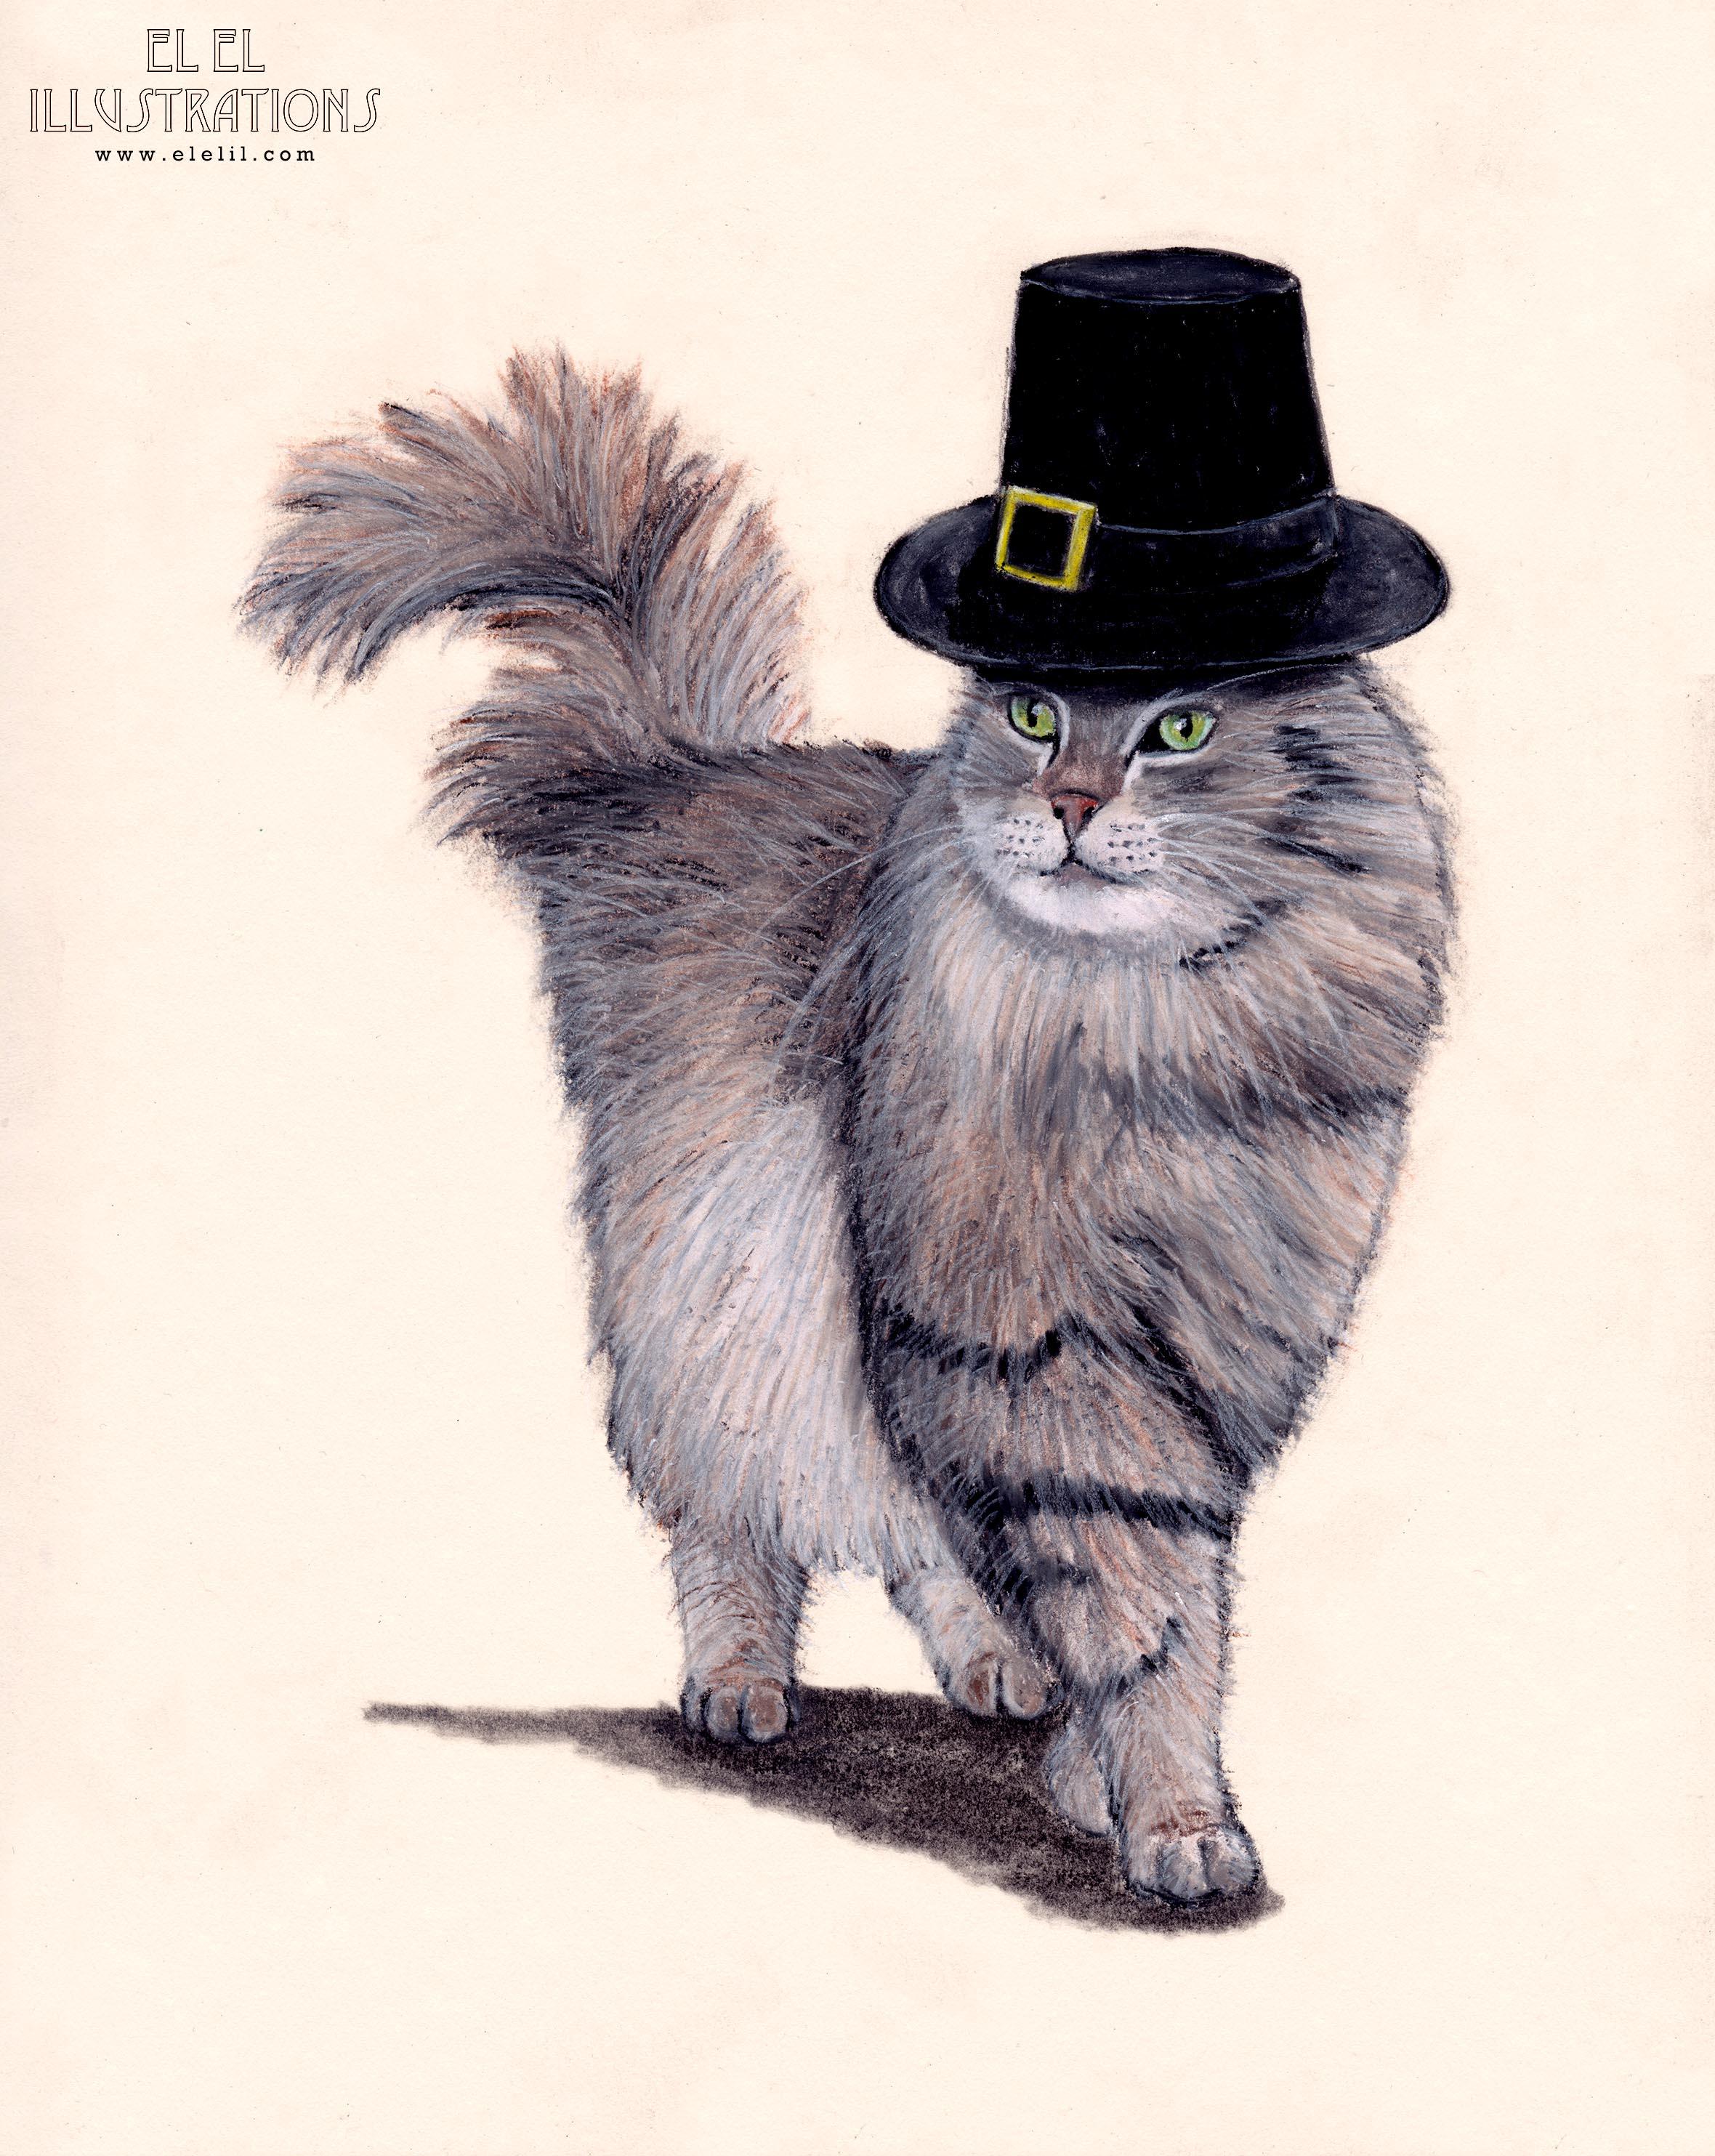 holiday_cat_thanksgiving_wm.jpg